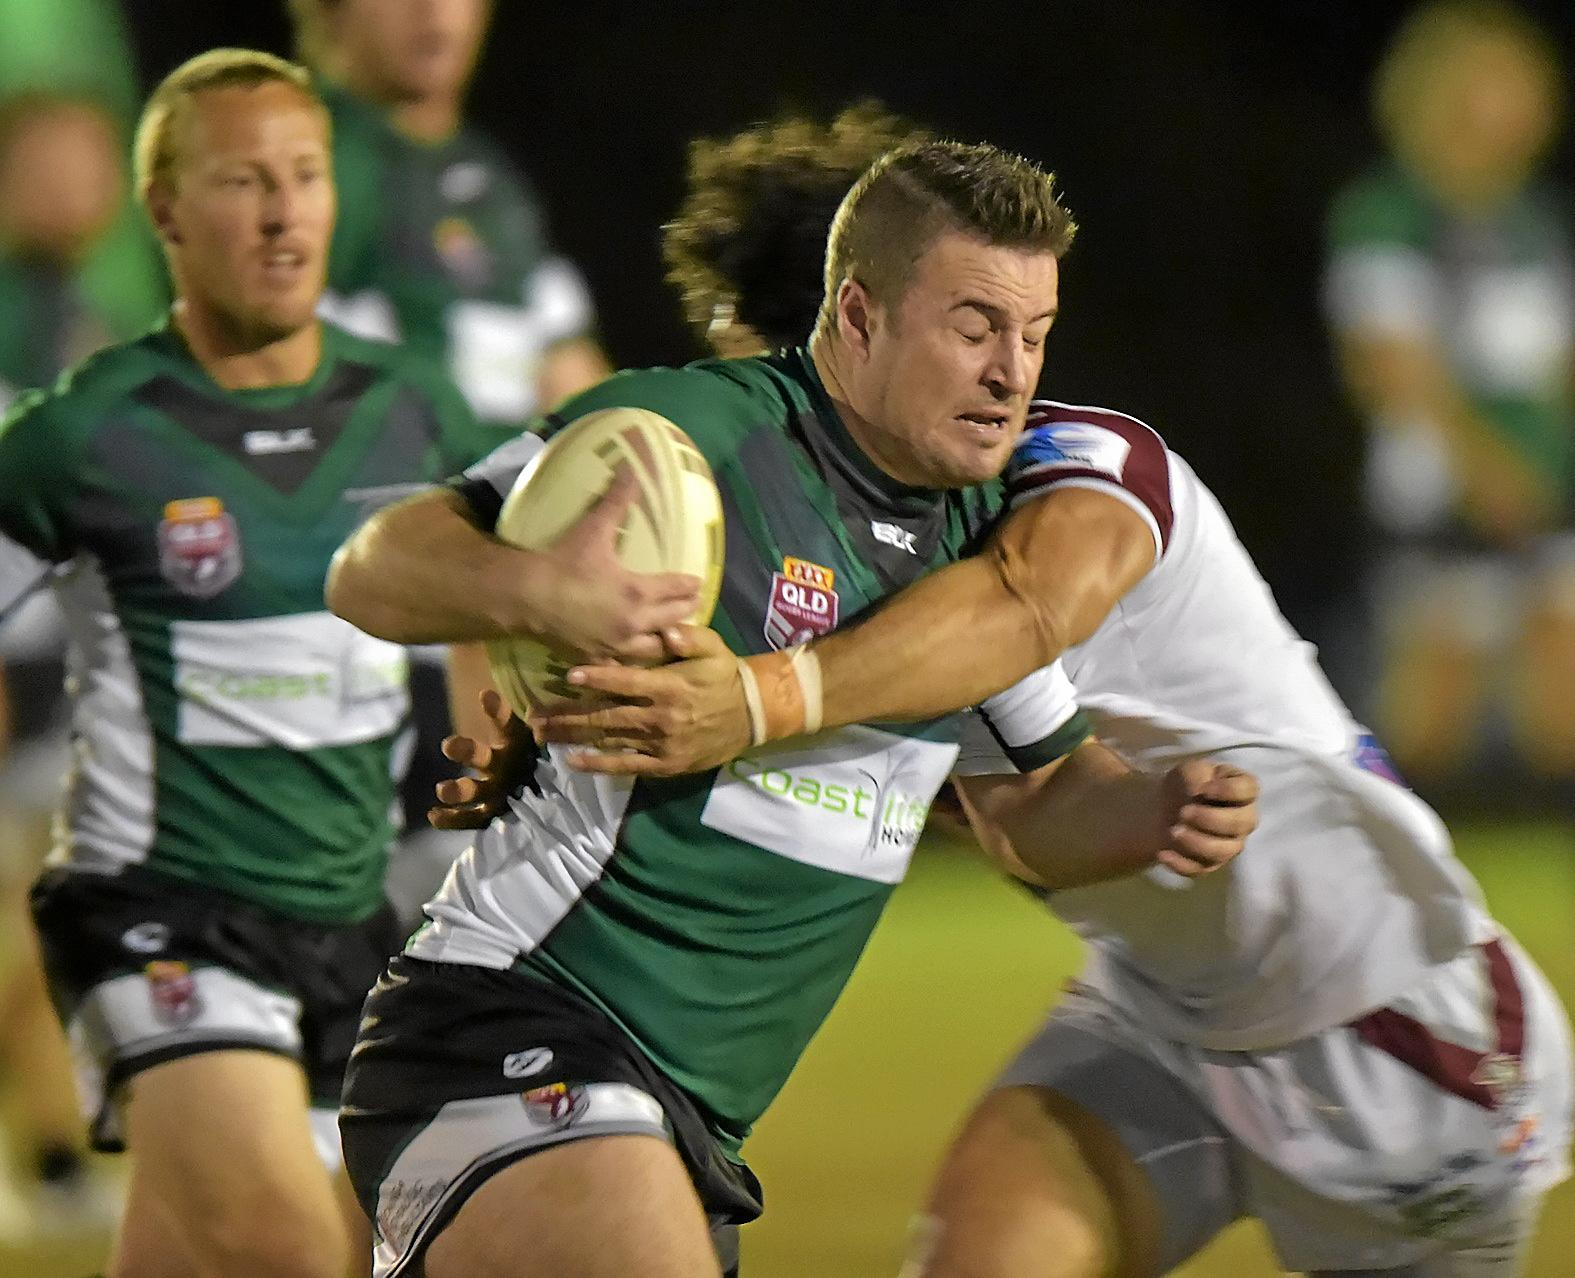 Maroochydore against Kawana rugby league match.Maroochydore forward Luke Roberts.